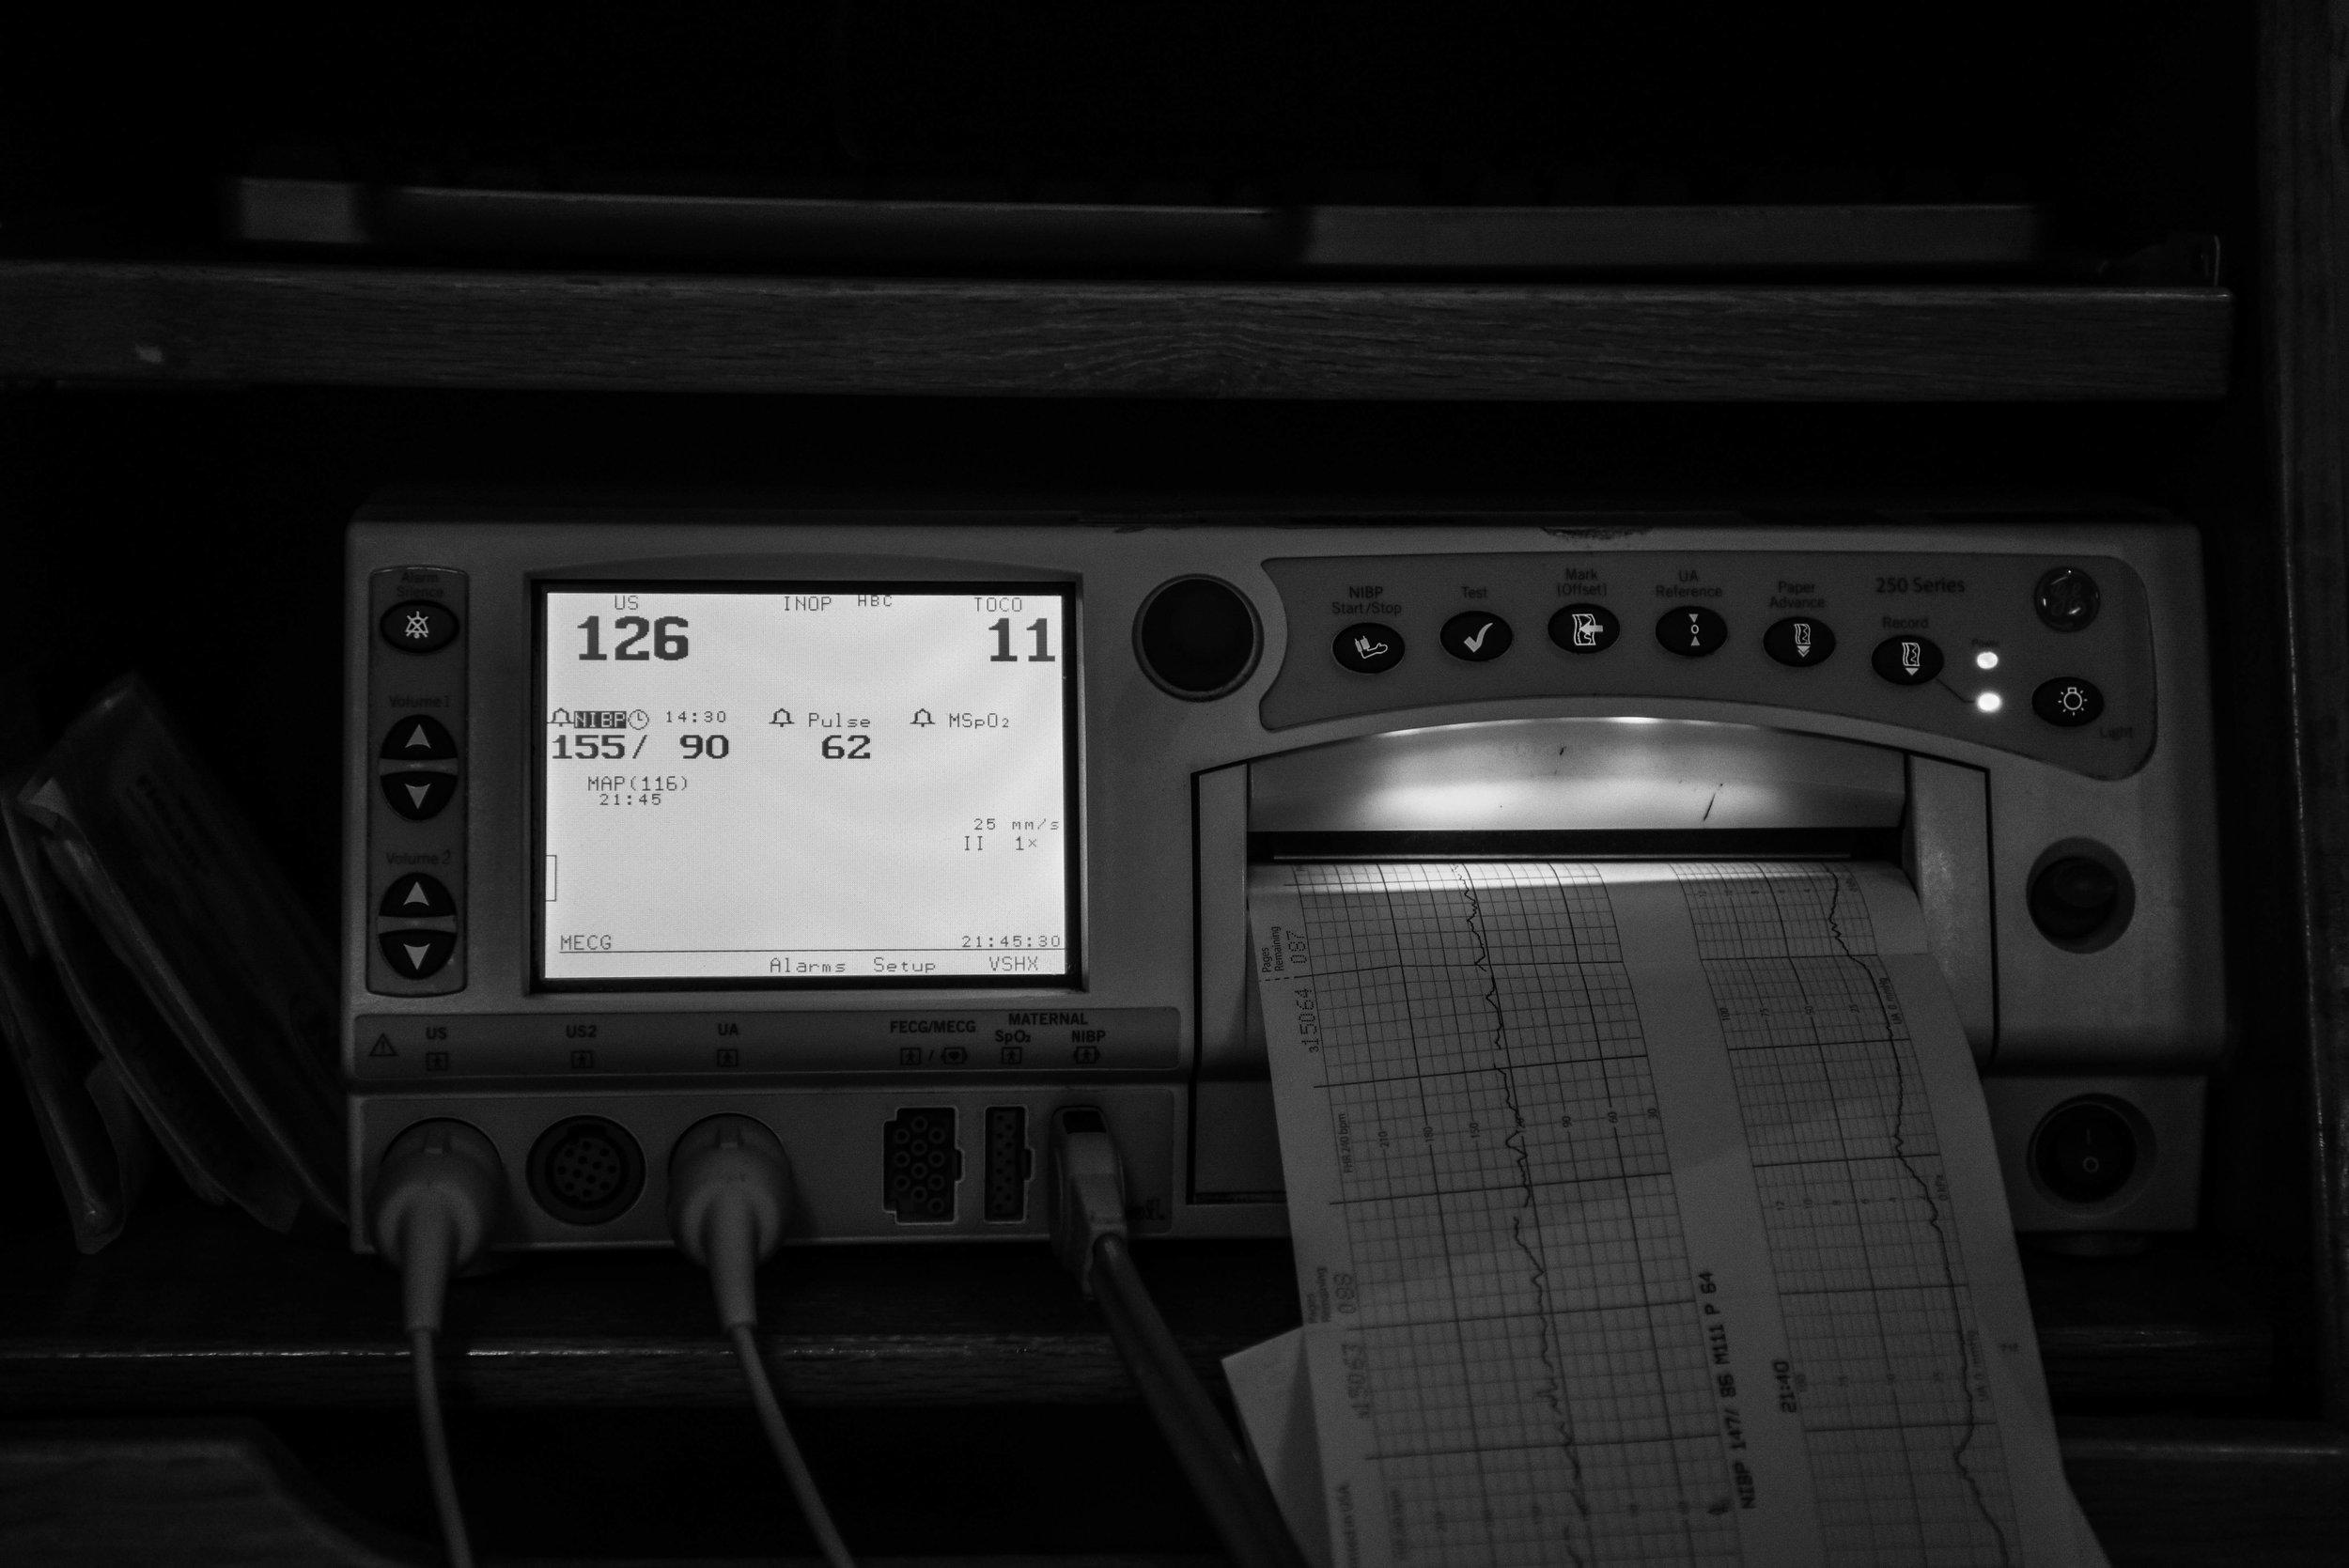 BMP_7379.jpg